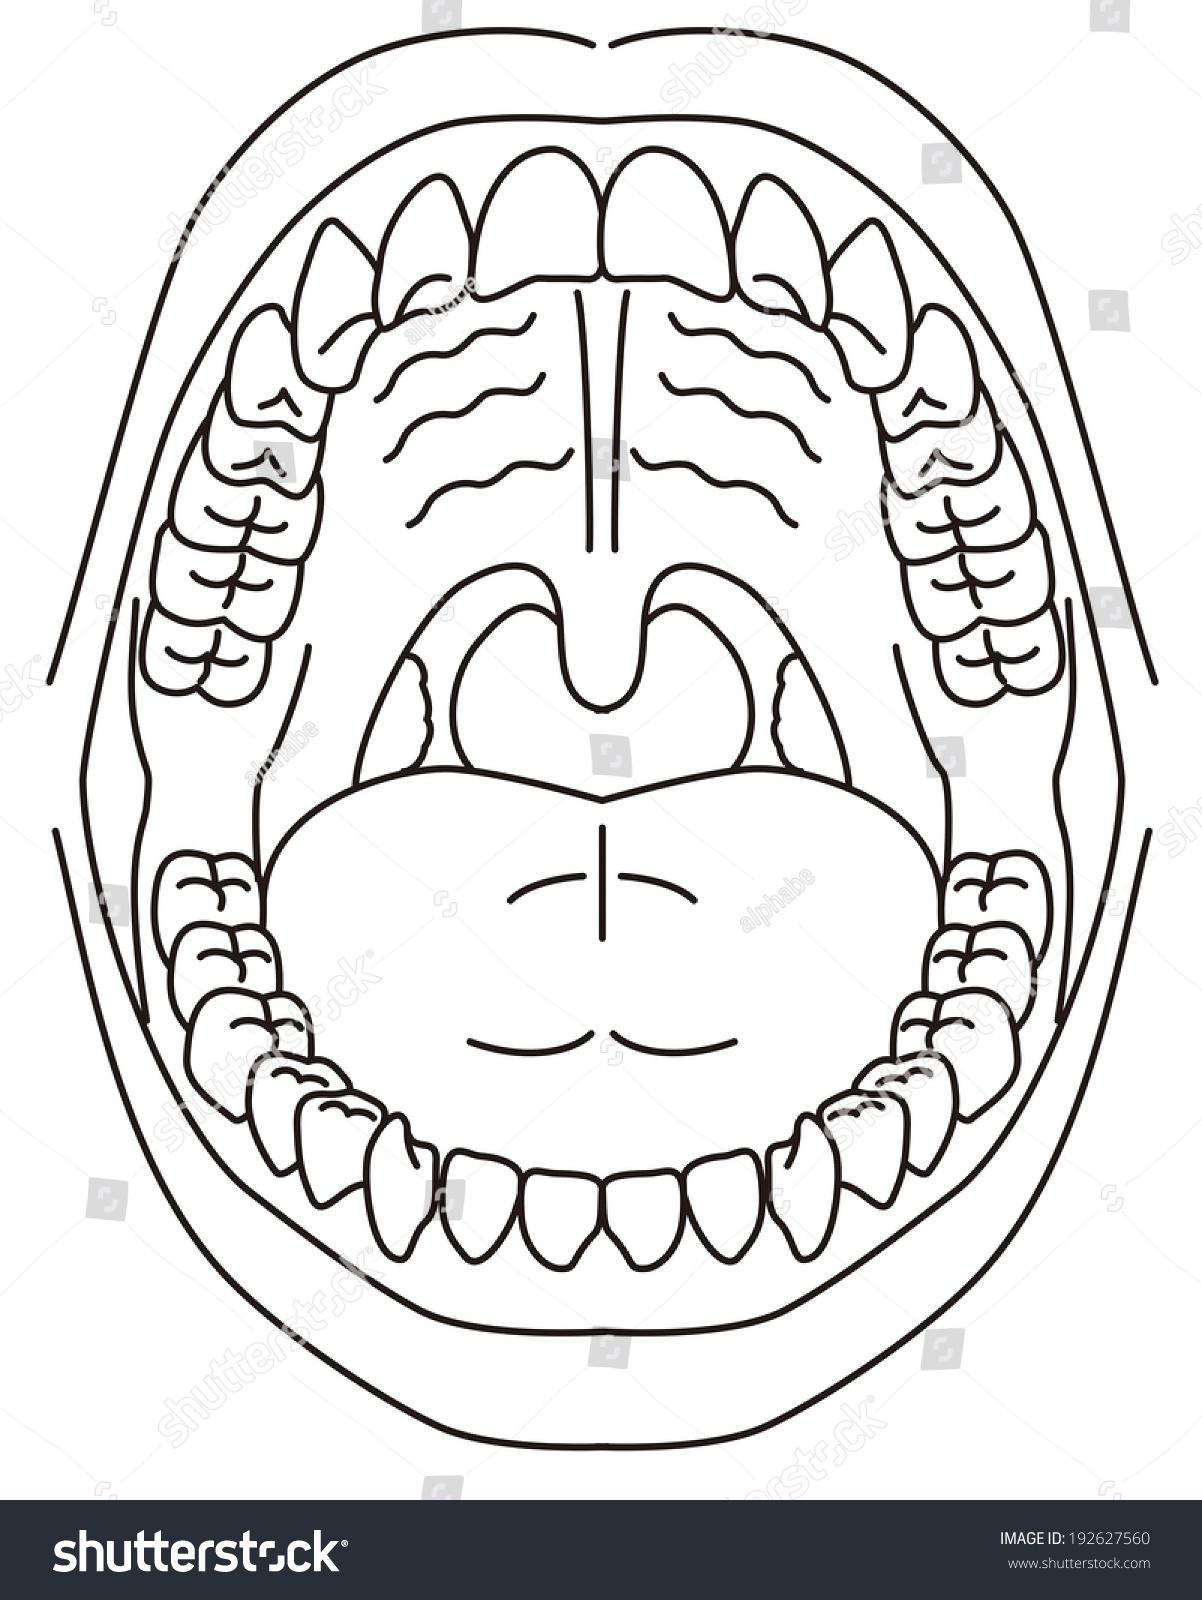 schematic diagram oral cavity stock vector (royalty free) 192627560